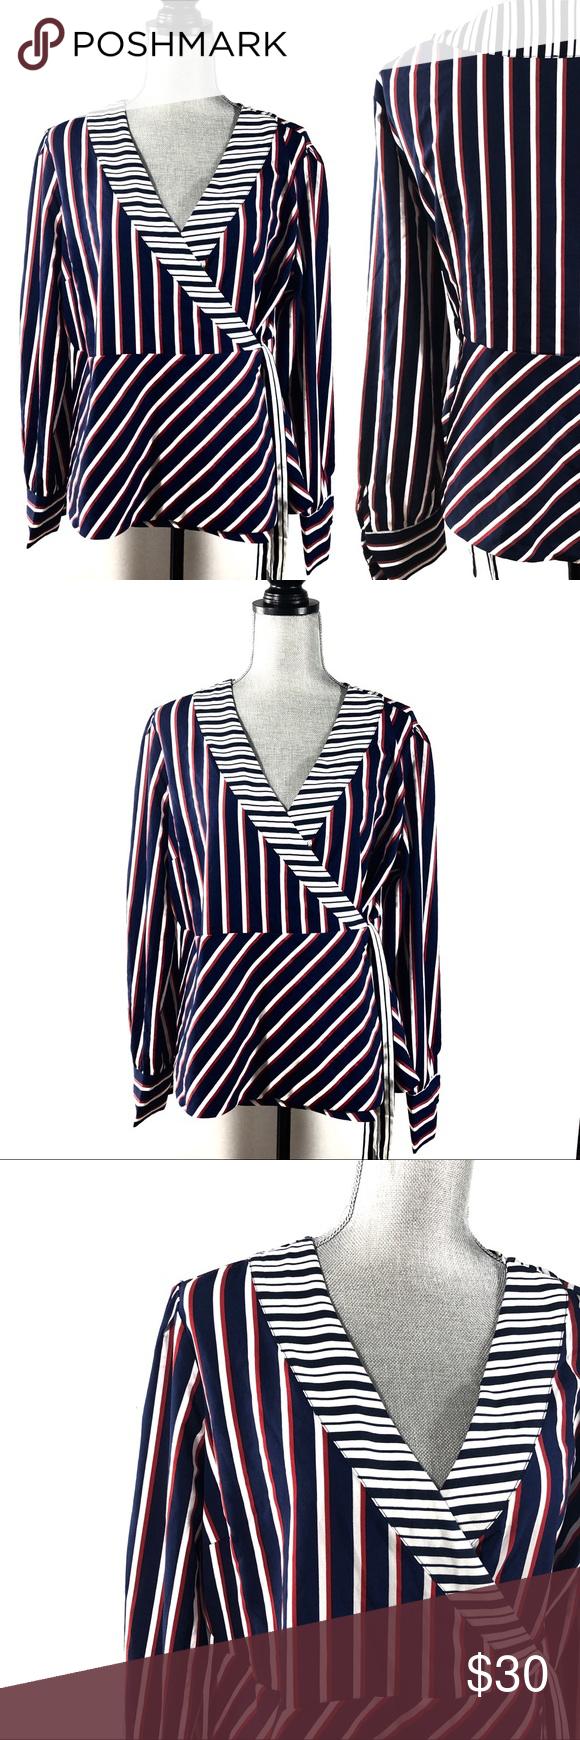 Paraphrase Red White Blue Wraparound Blouse Stripe Pattern Clothe Design Work Attire Custom Clothing